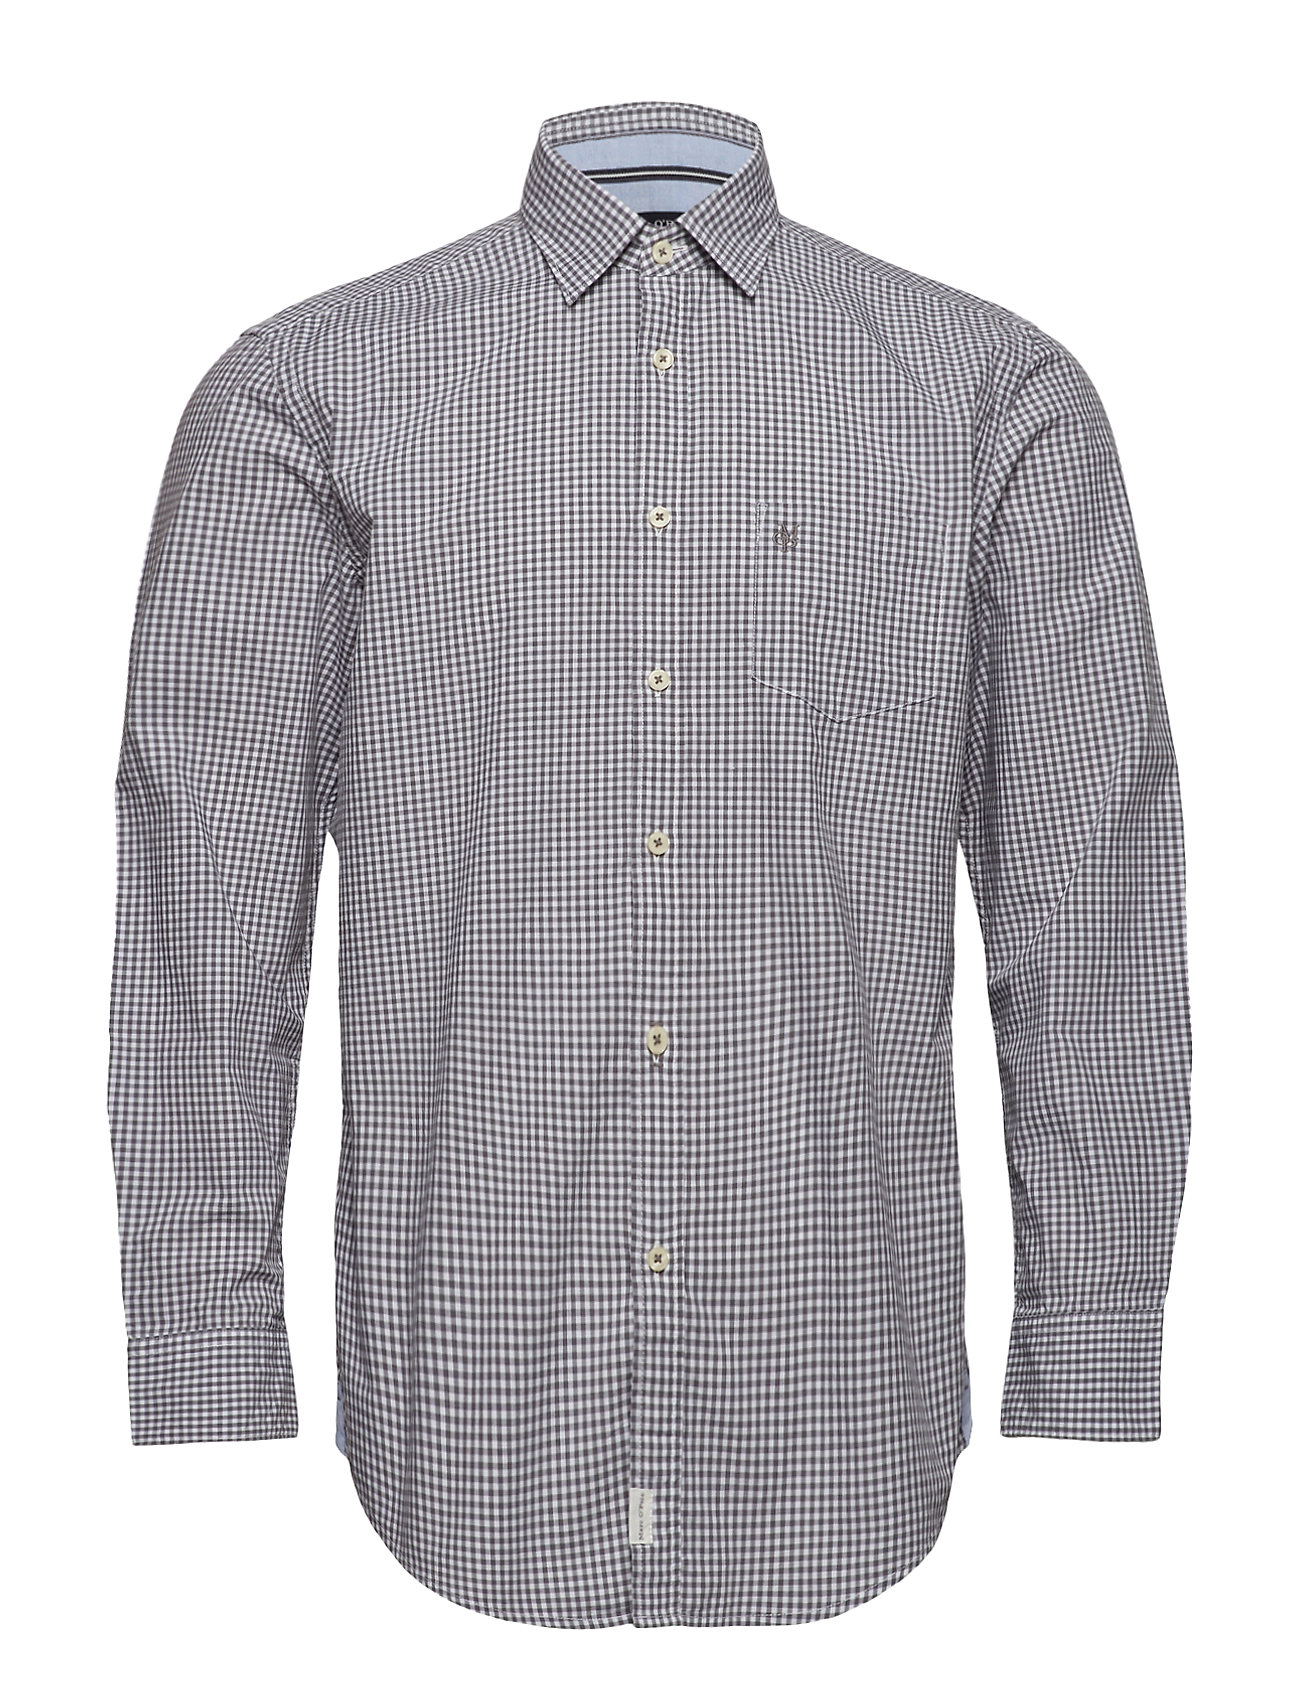 Marc O'Polo Shirt - COMBO